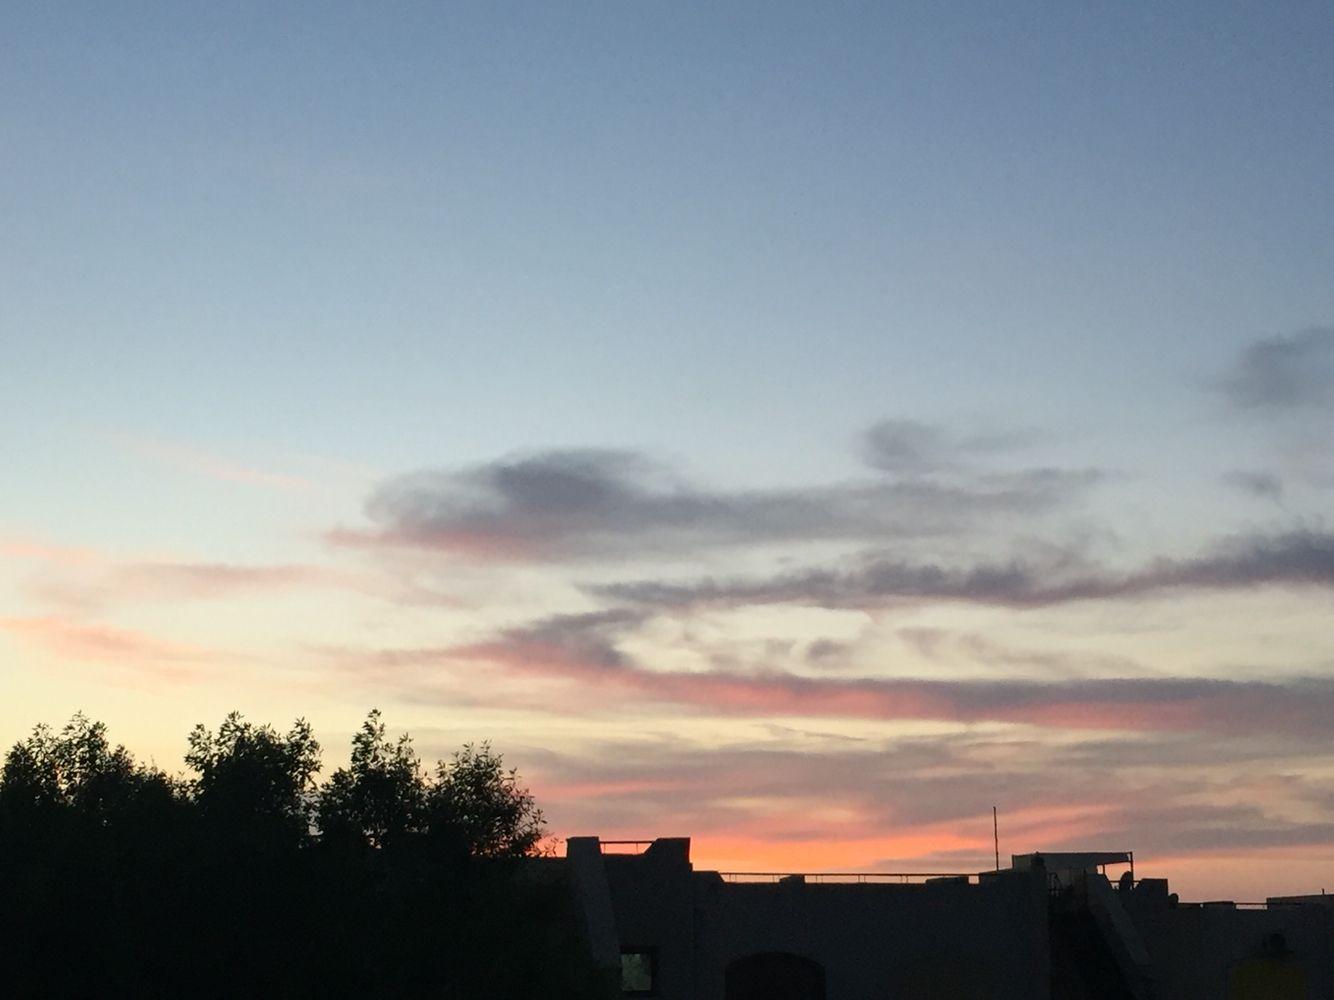 غروب الشمس الساحل الشمالي Sunset North Cost Alexandria Sunset Sky Celestial